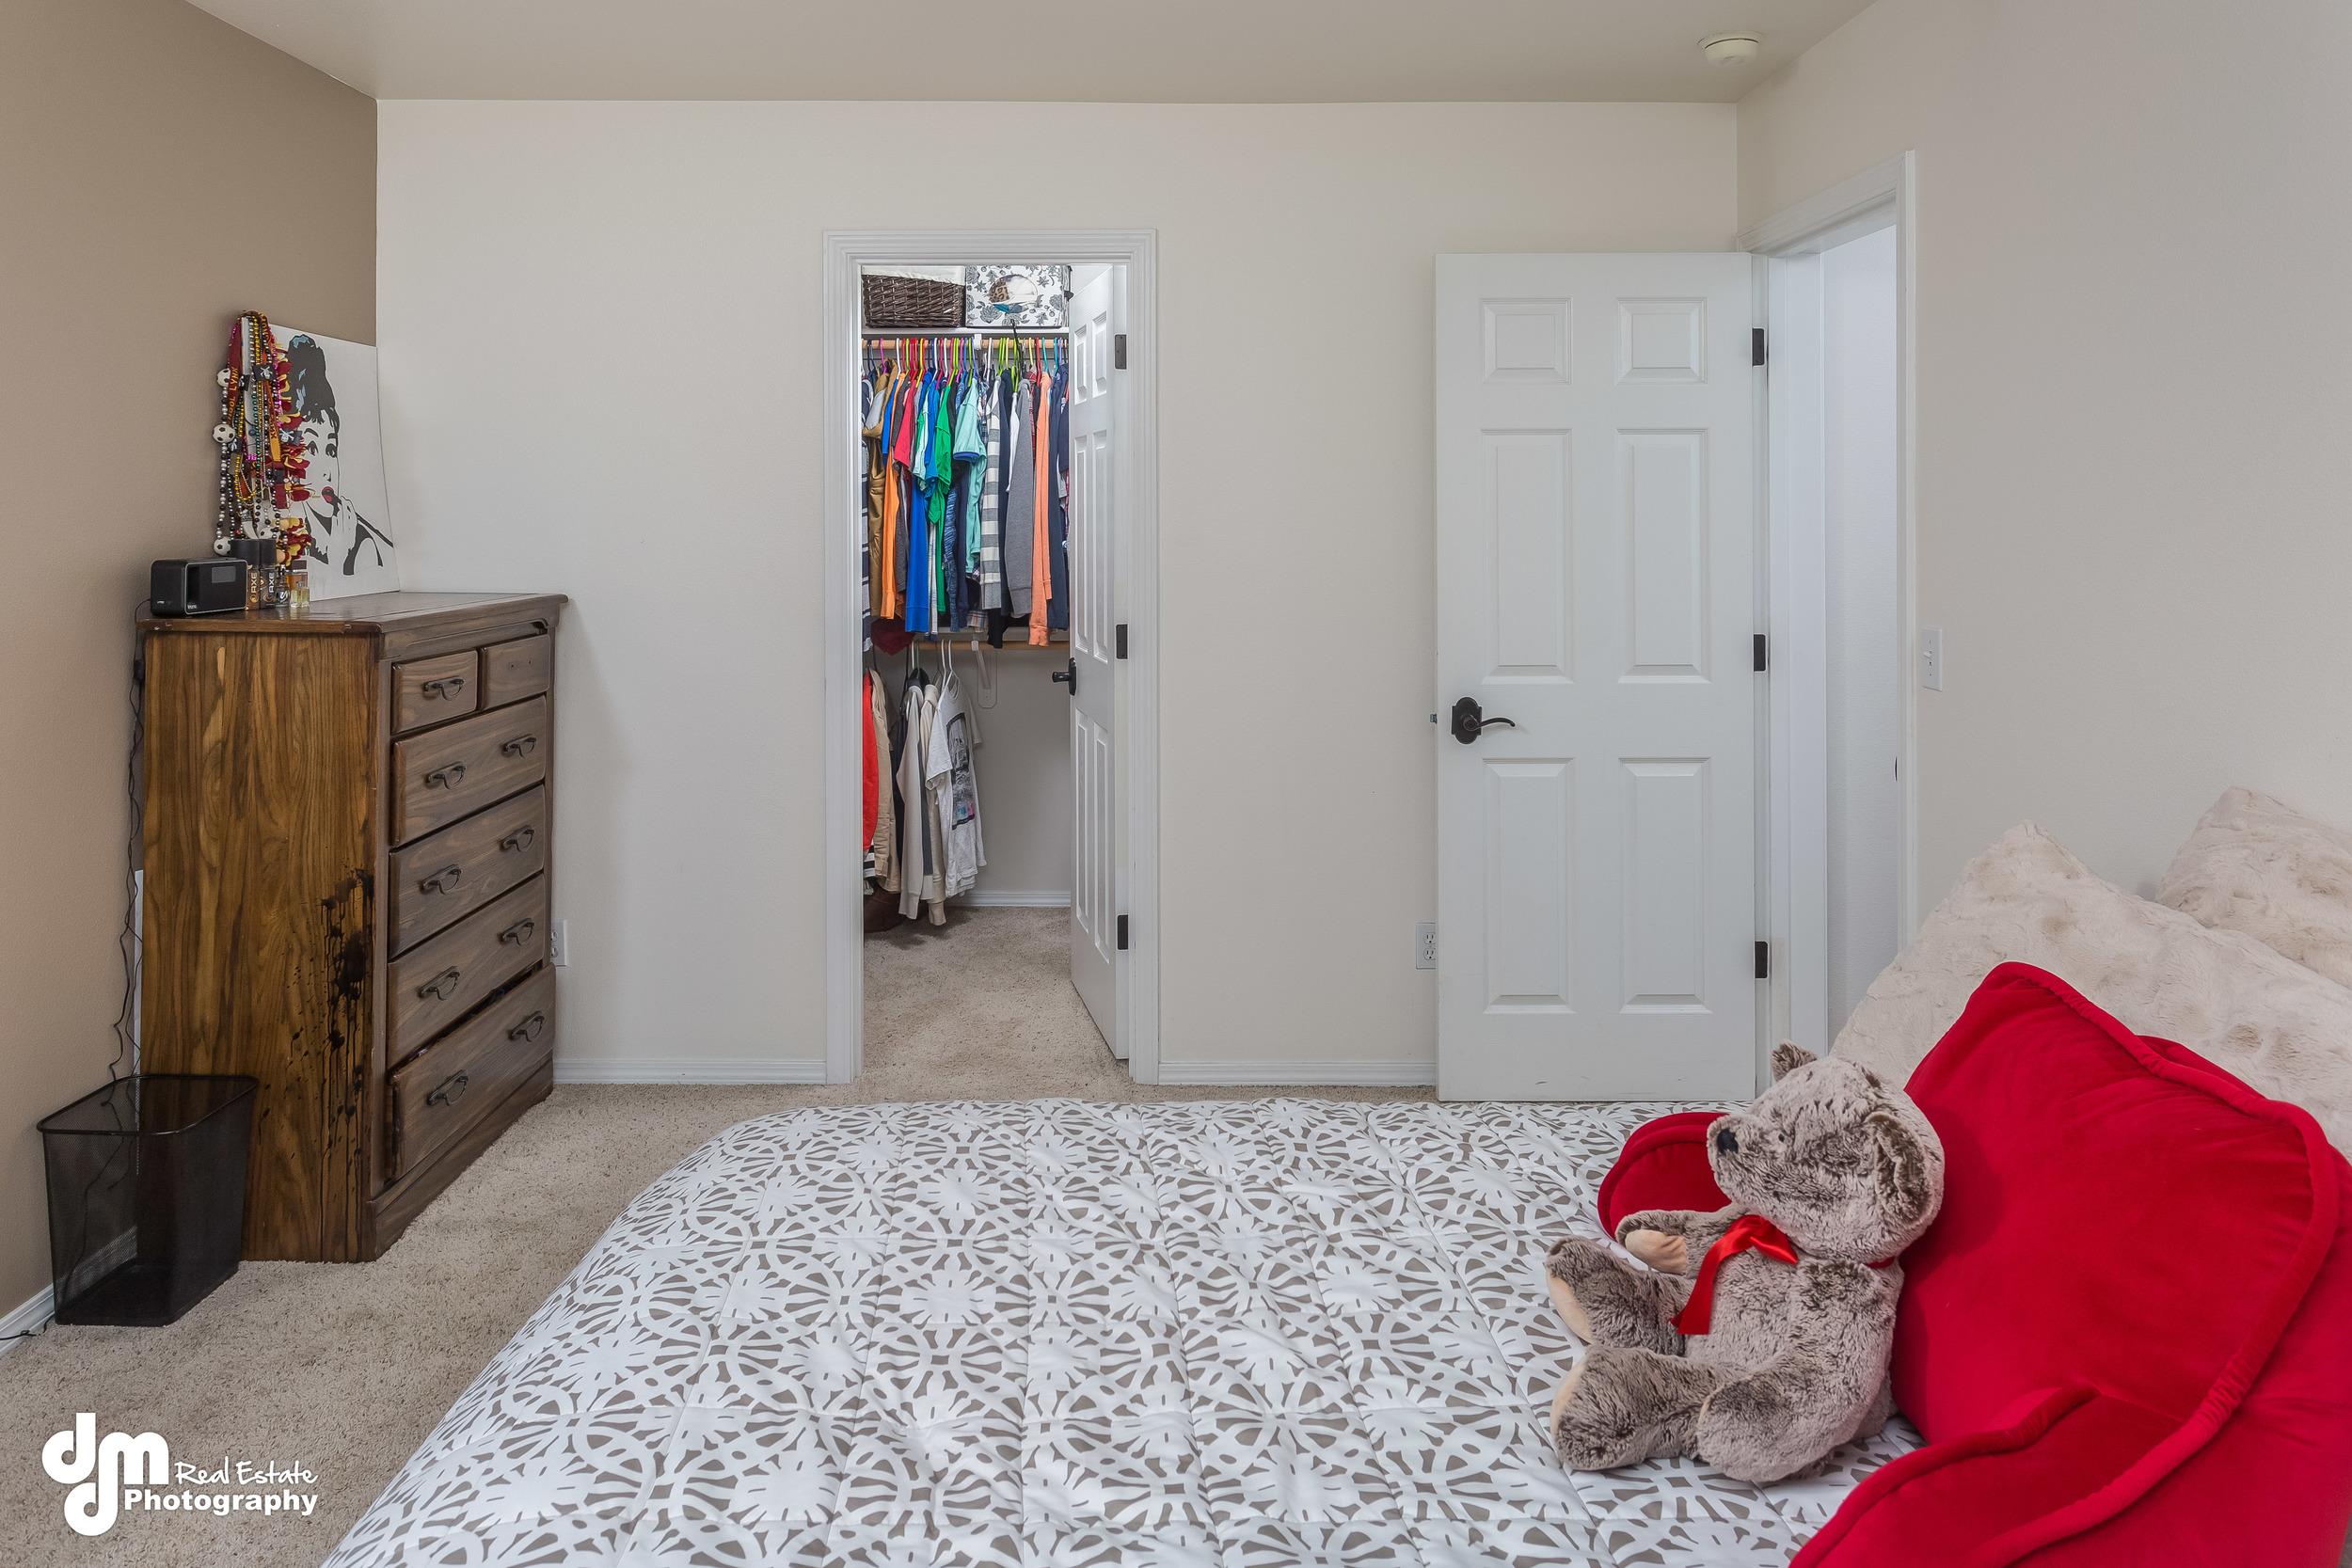 Bedroom 3_DMD_6696.jpg